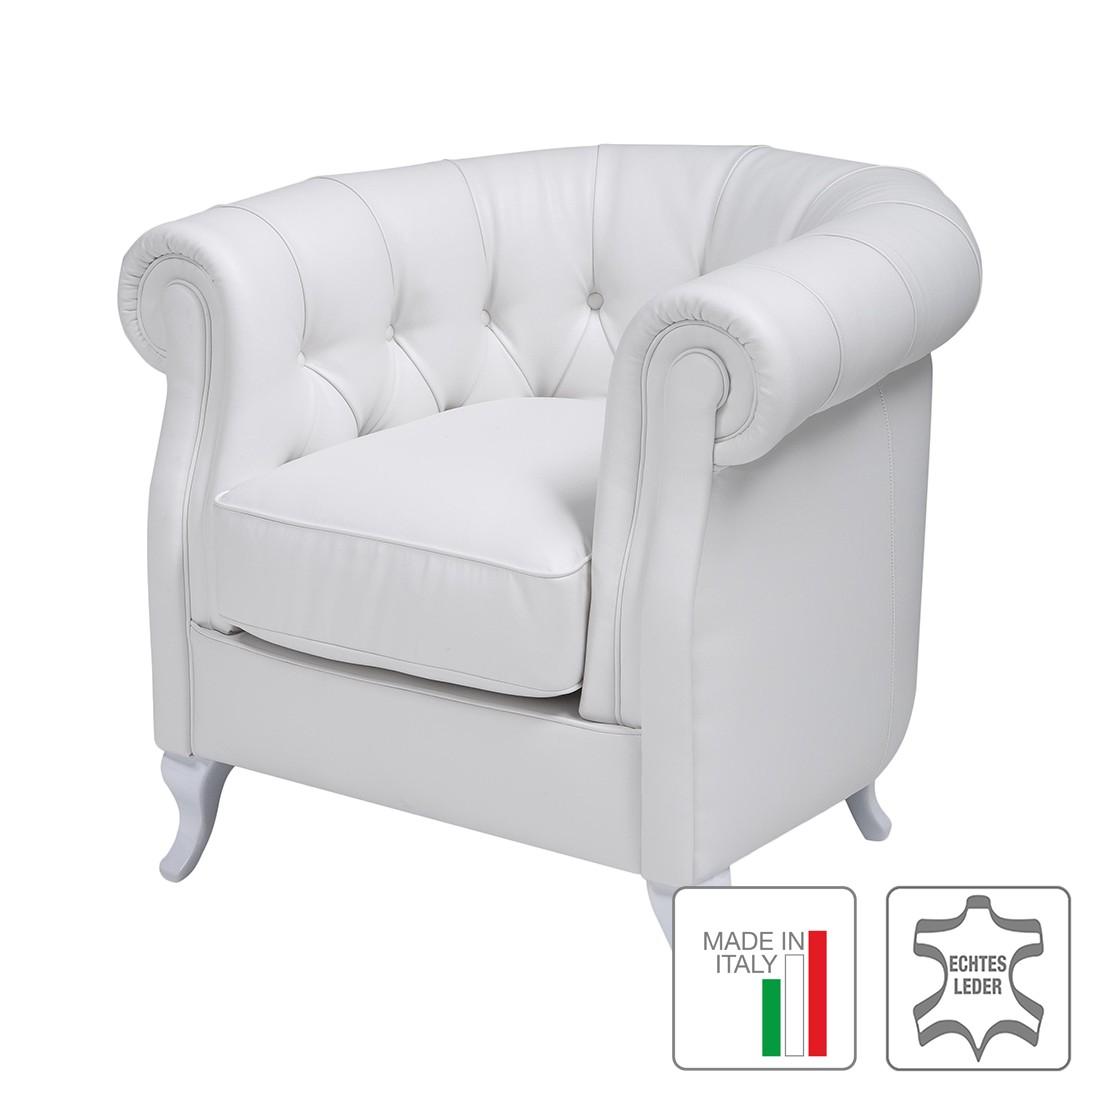 Sessel Nabucco – Echtleder Weiß, Trend Italiano günstig bestellen